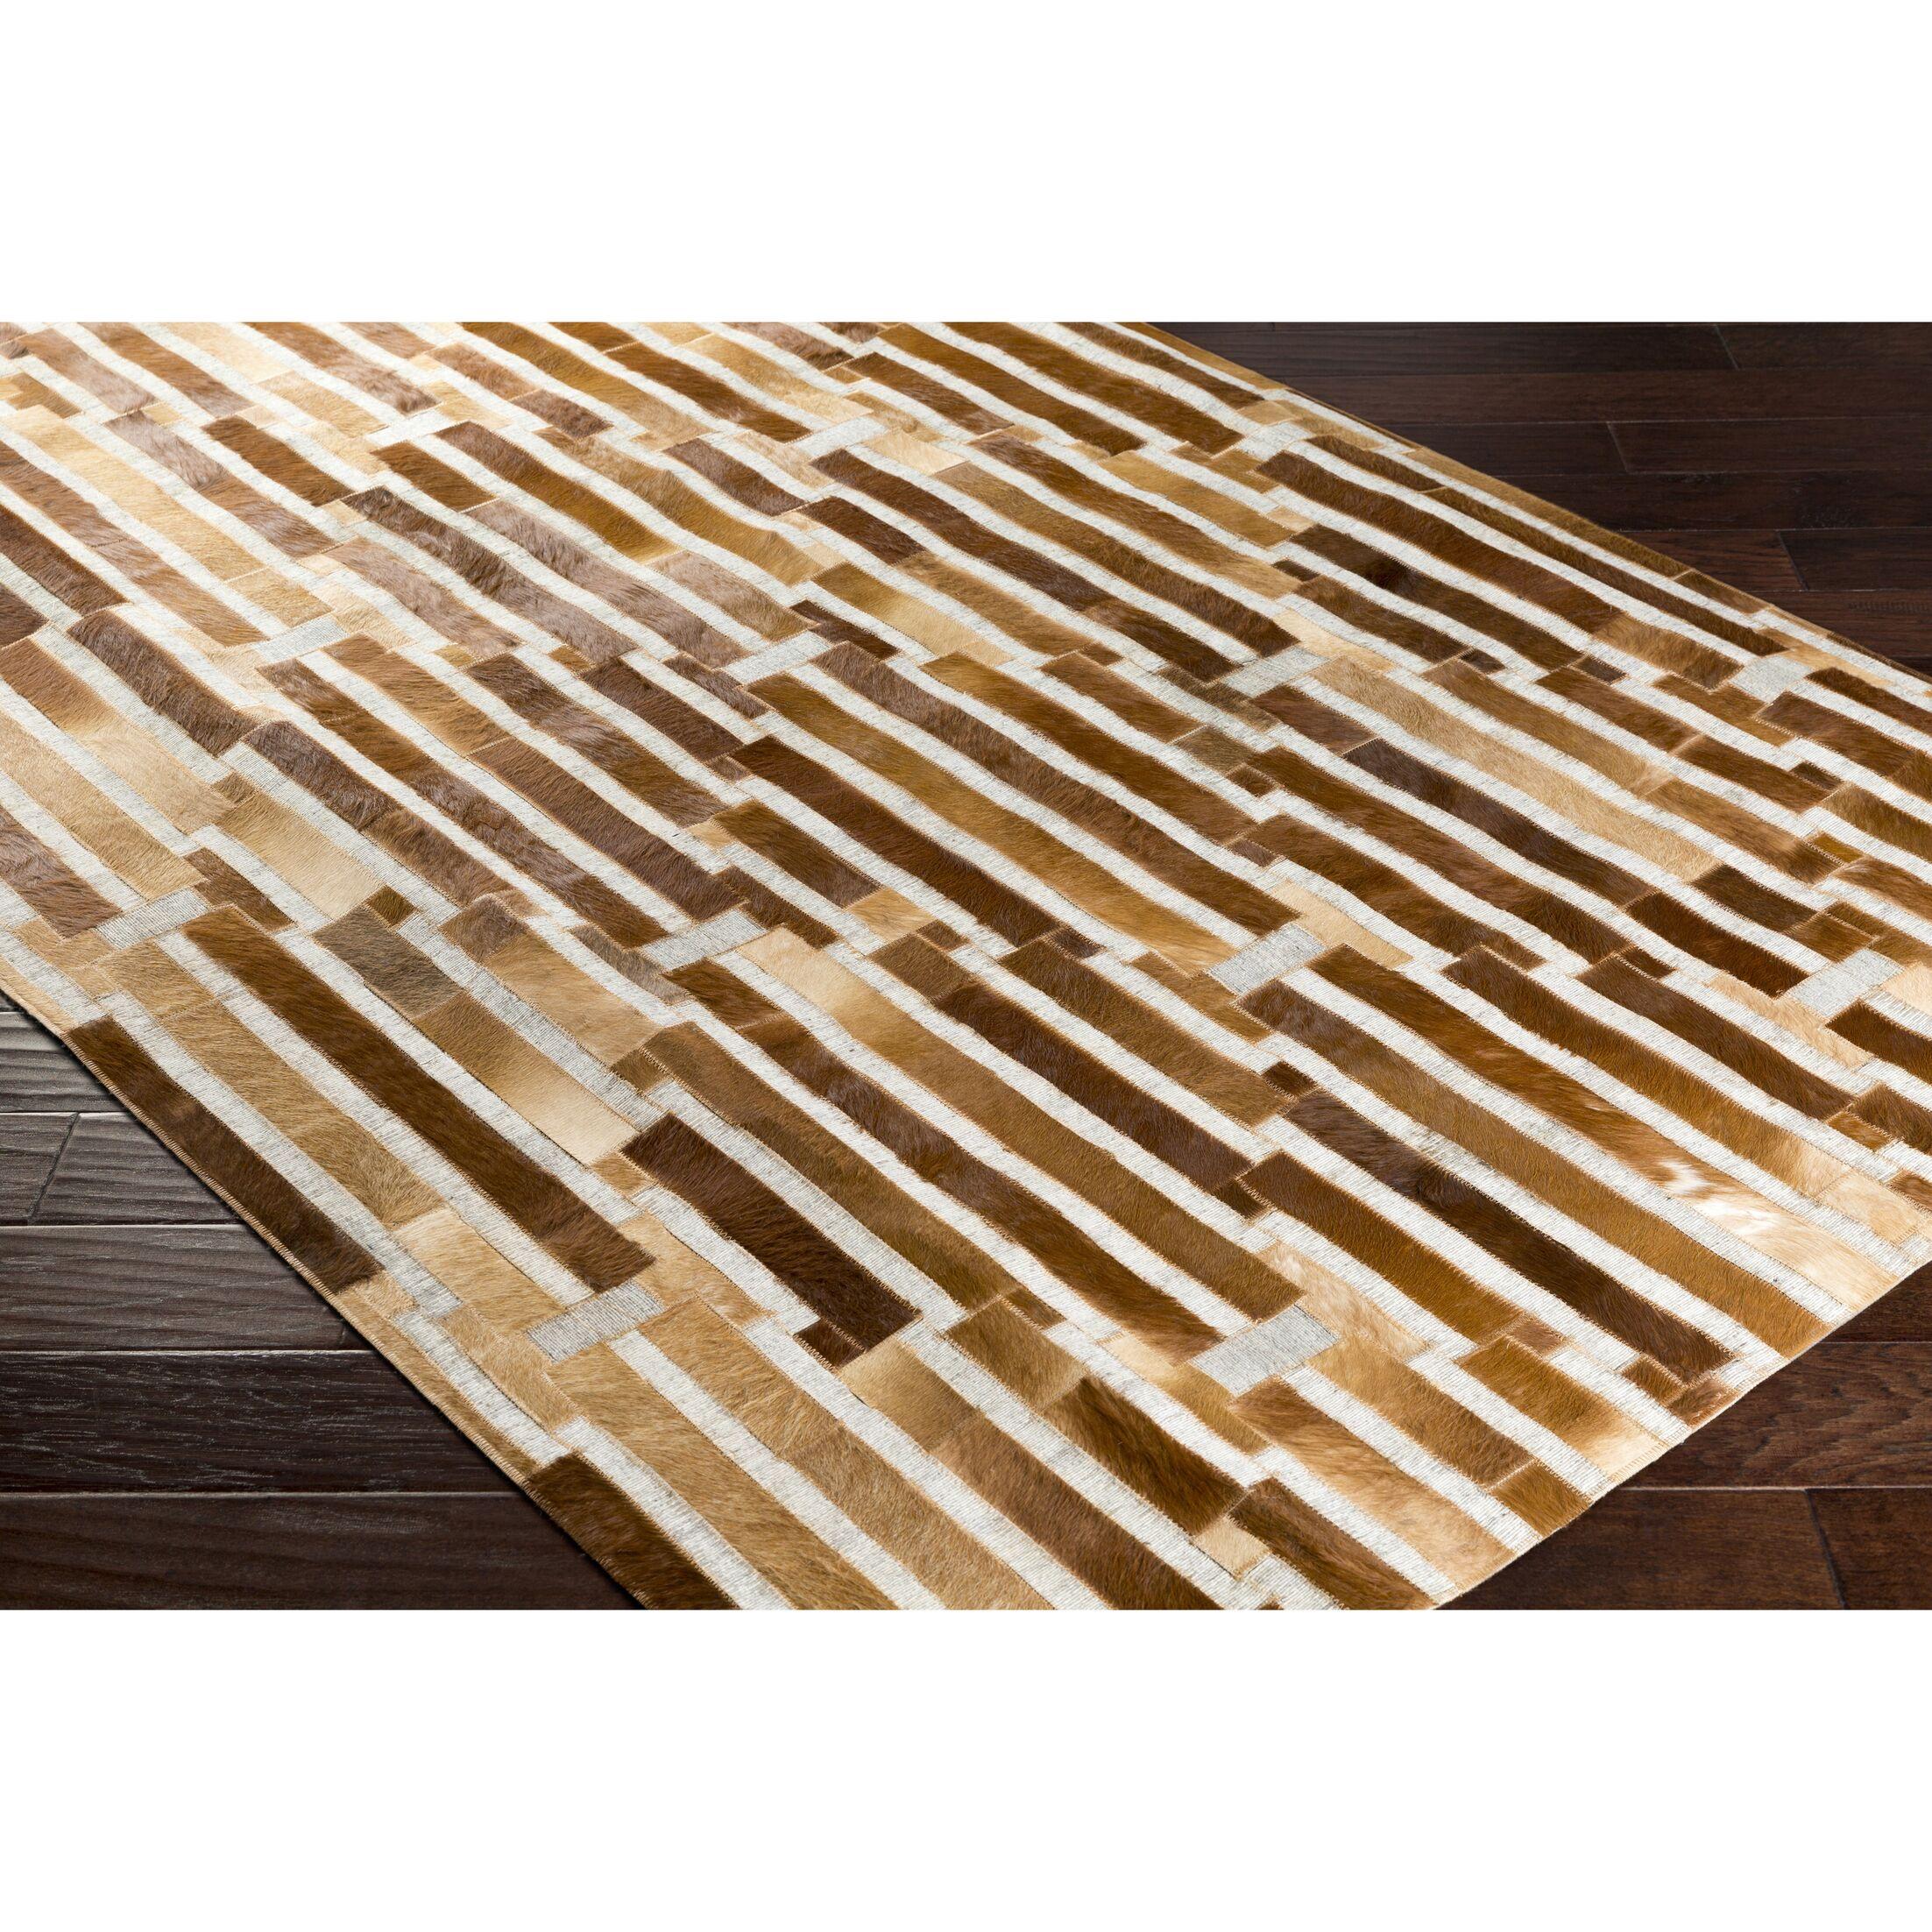 Armando Hand-Crafted Geometric Brown Area Rug Rug Size: Rectangle 5' x 7'6